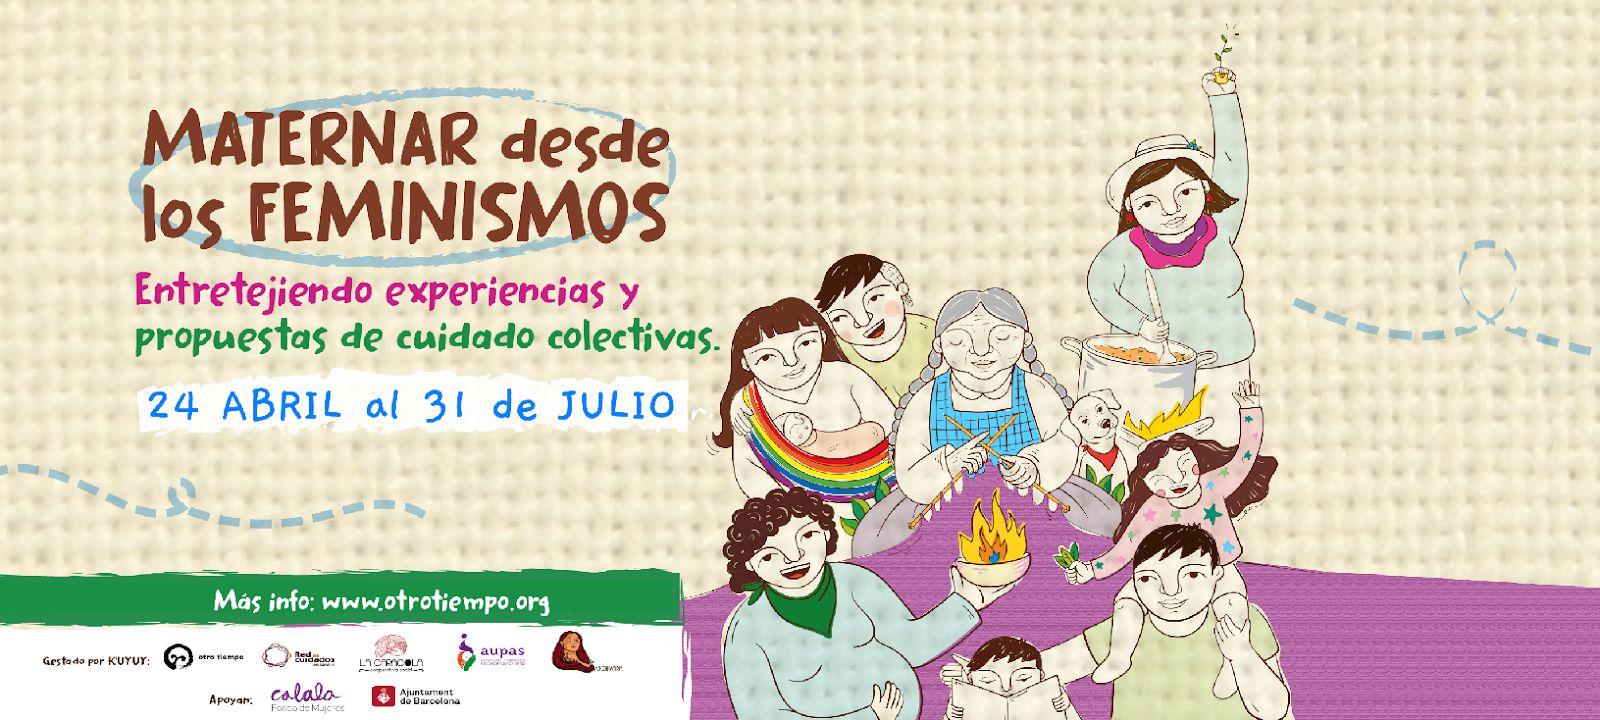 taller maternidades feminismos kuyuy